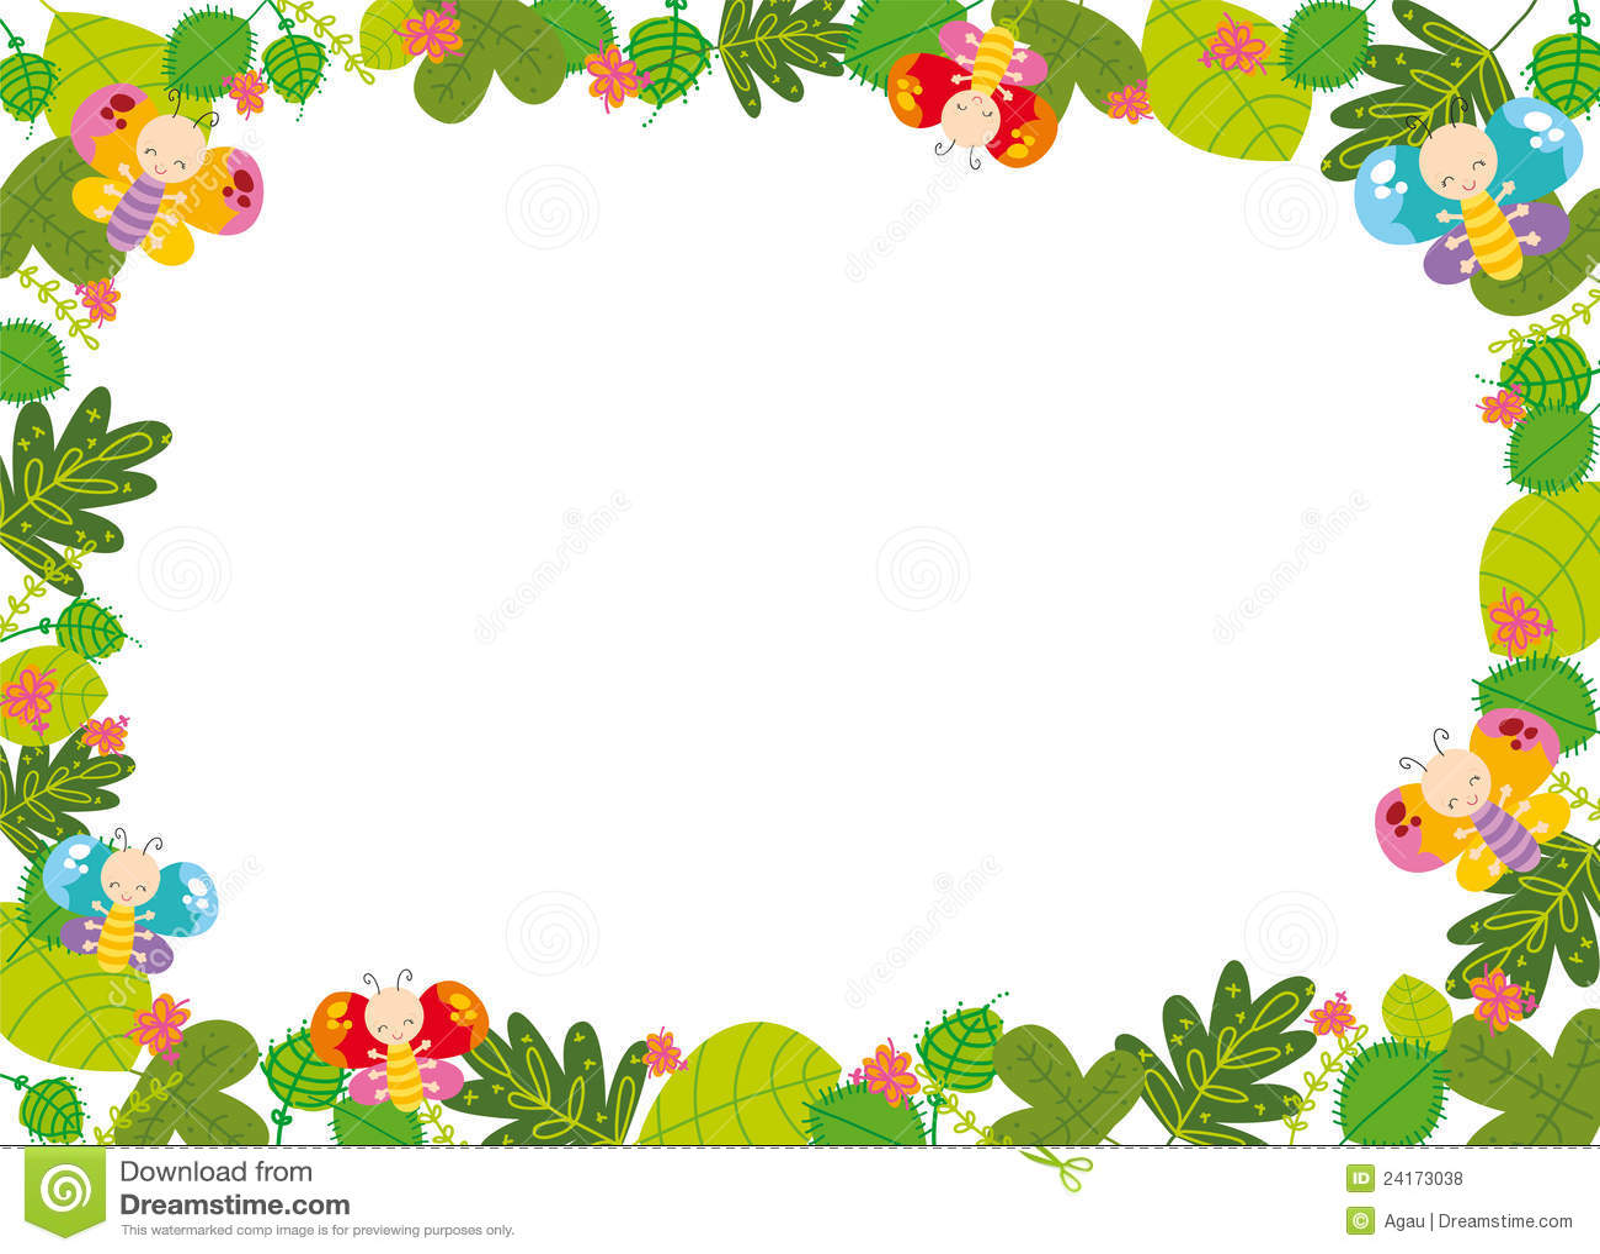 Весна картинки для детей  steshkaru